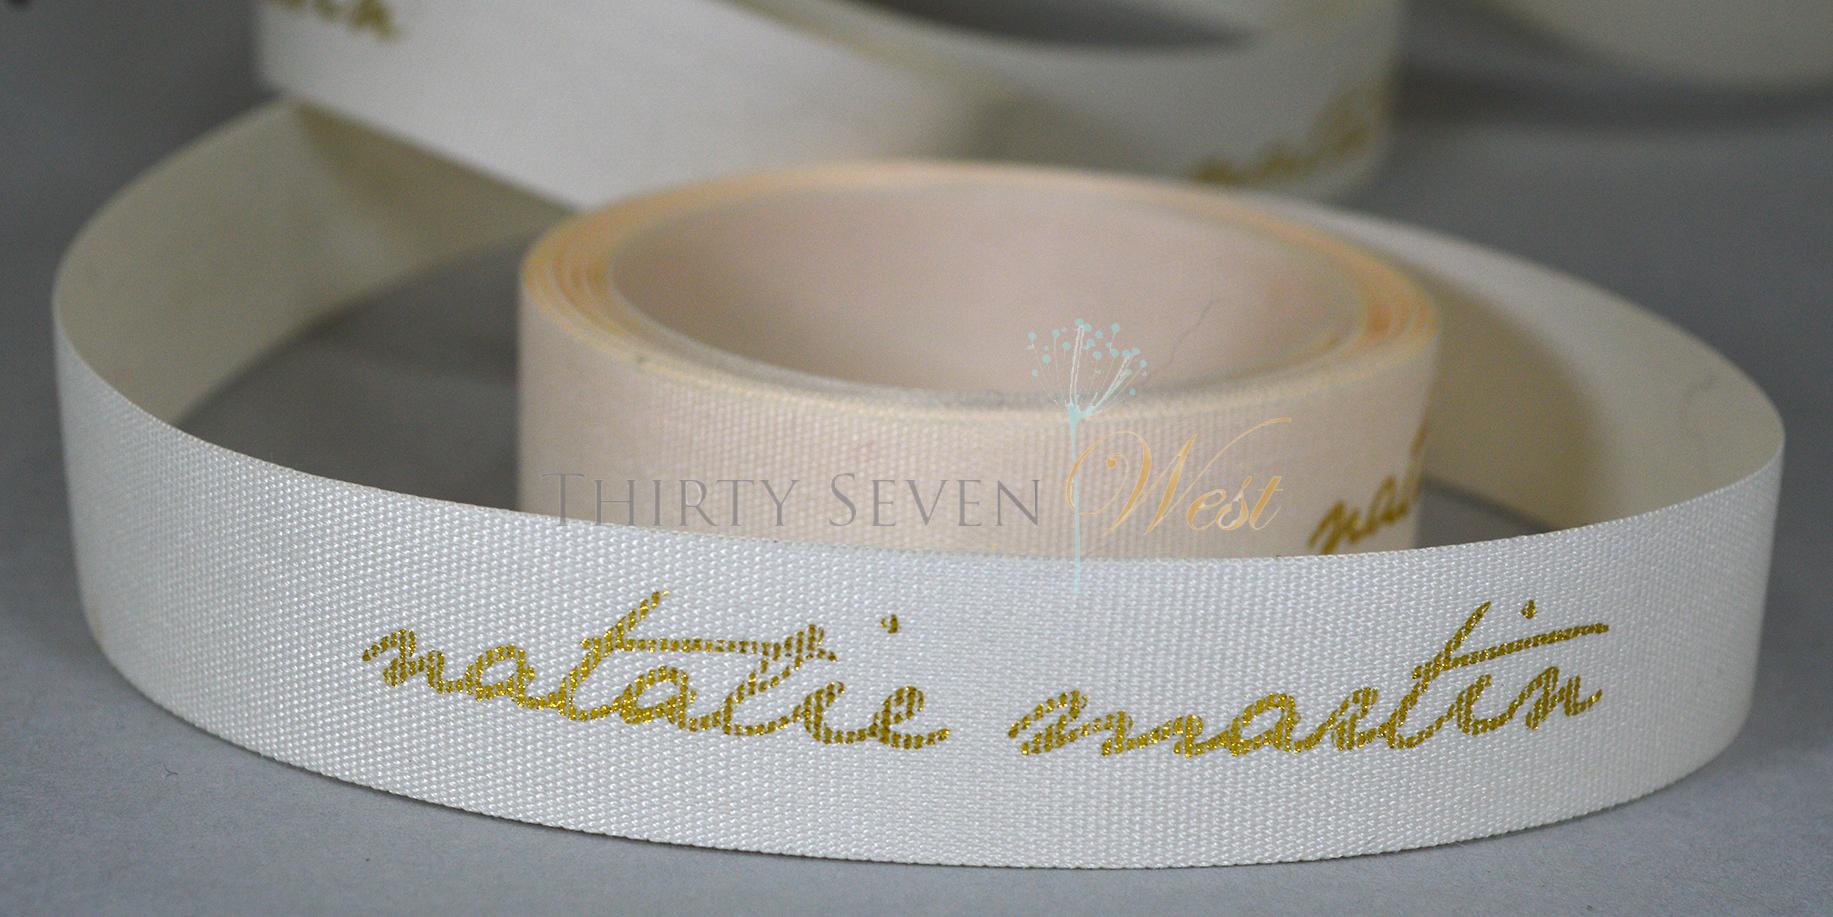 Texture Ribbon, Printed Ribbon, Gold Printed Ribbon, Business Logo on Ribbon, Metallic Printed Ribbon,  Matte Textured Ribbon.